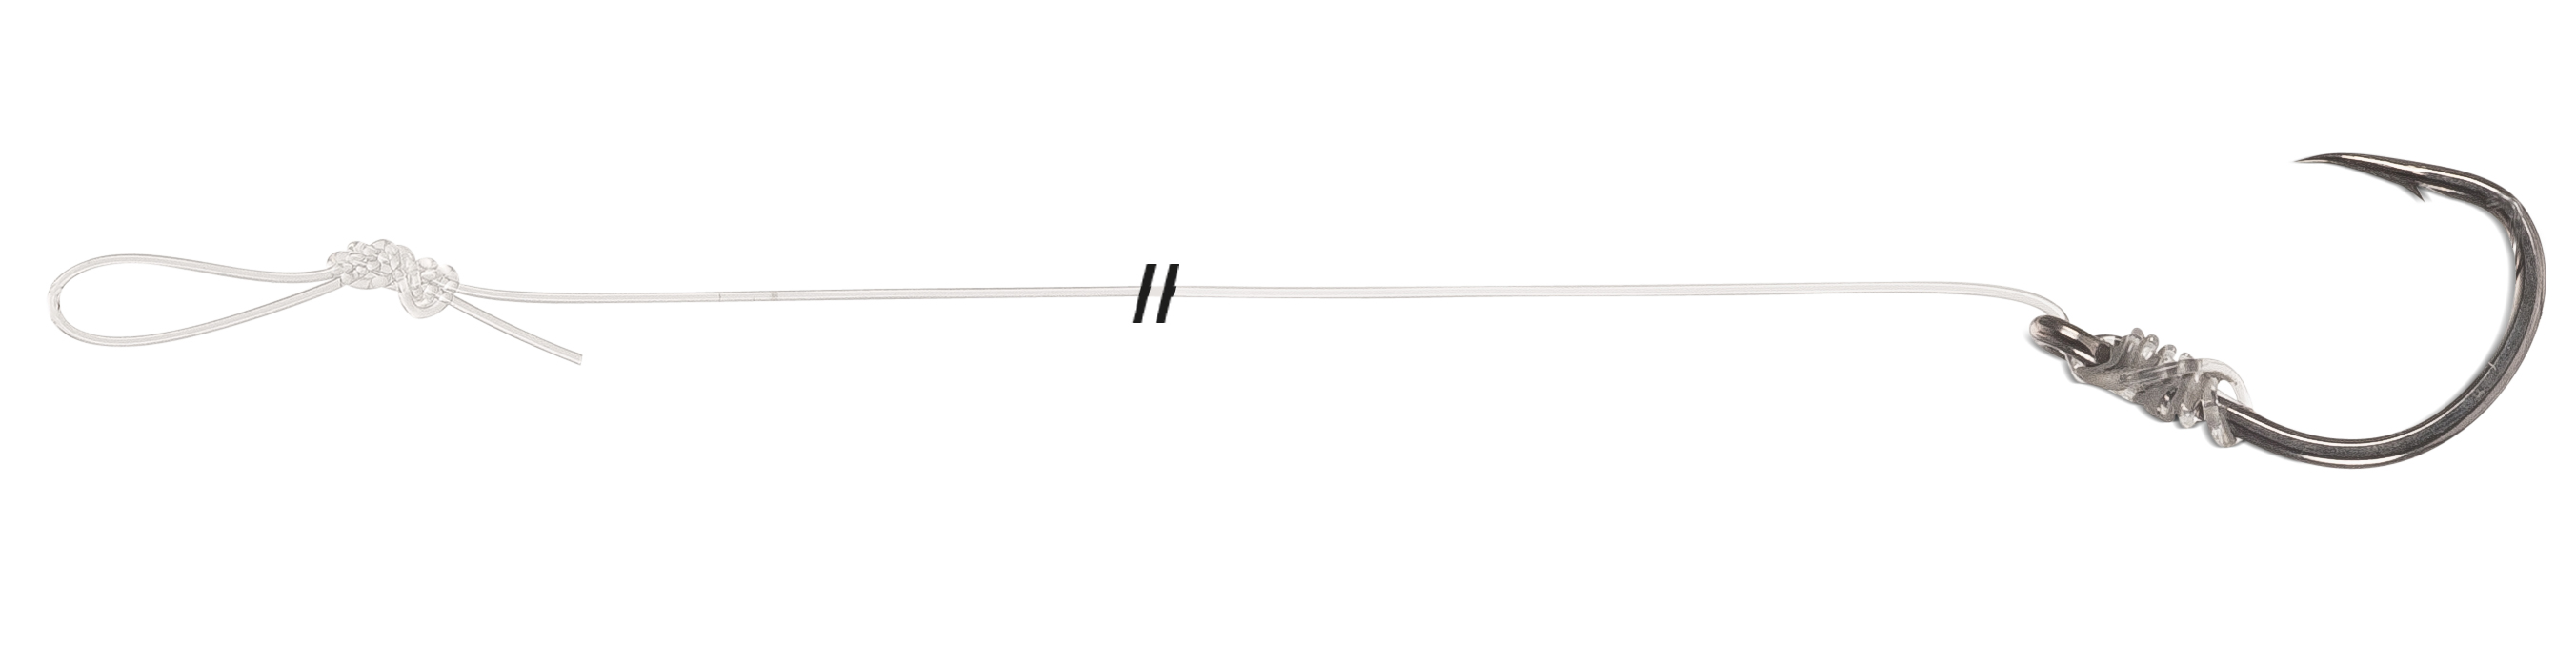 Návazec Uni Cat  S-Hook Mono Rig Velikost 8/0